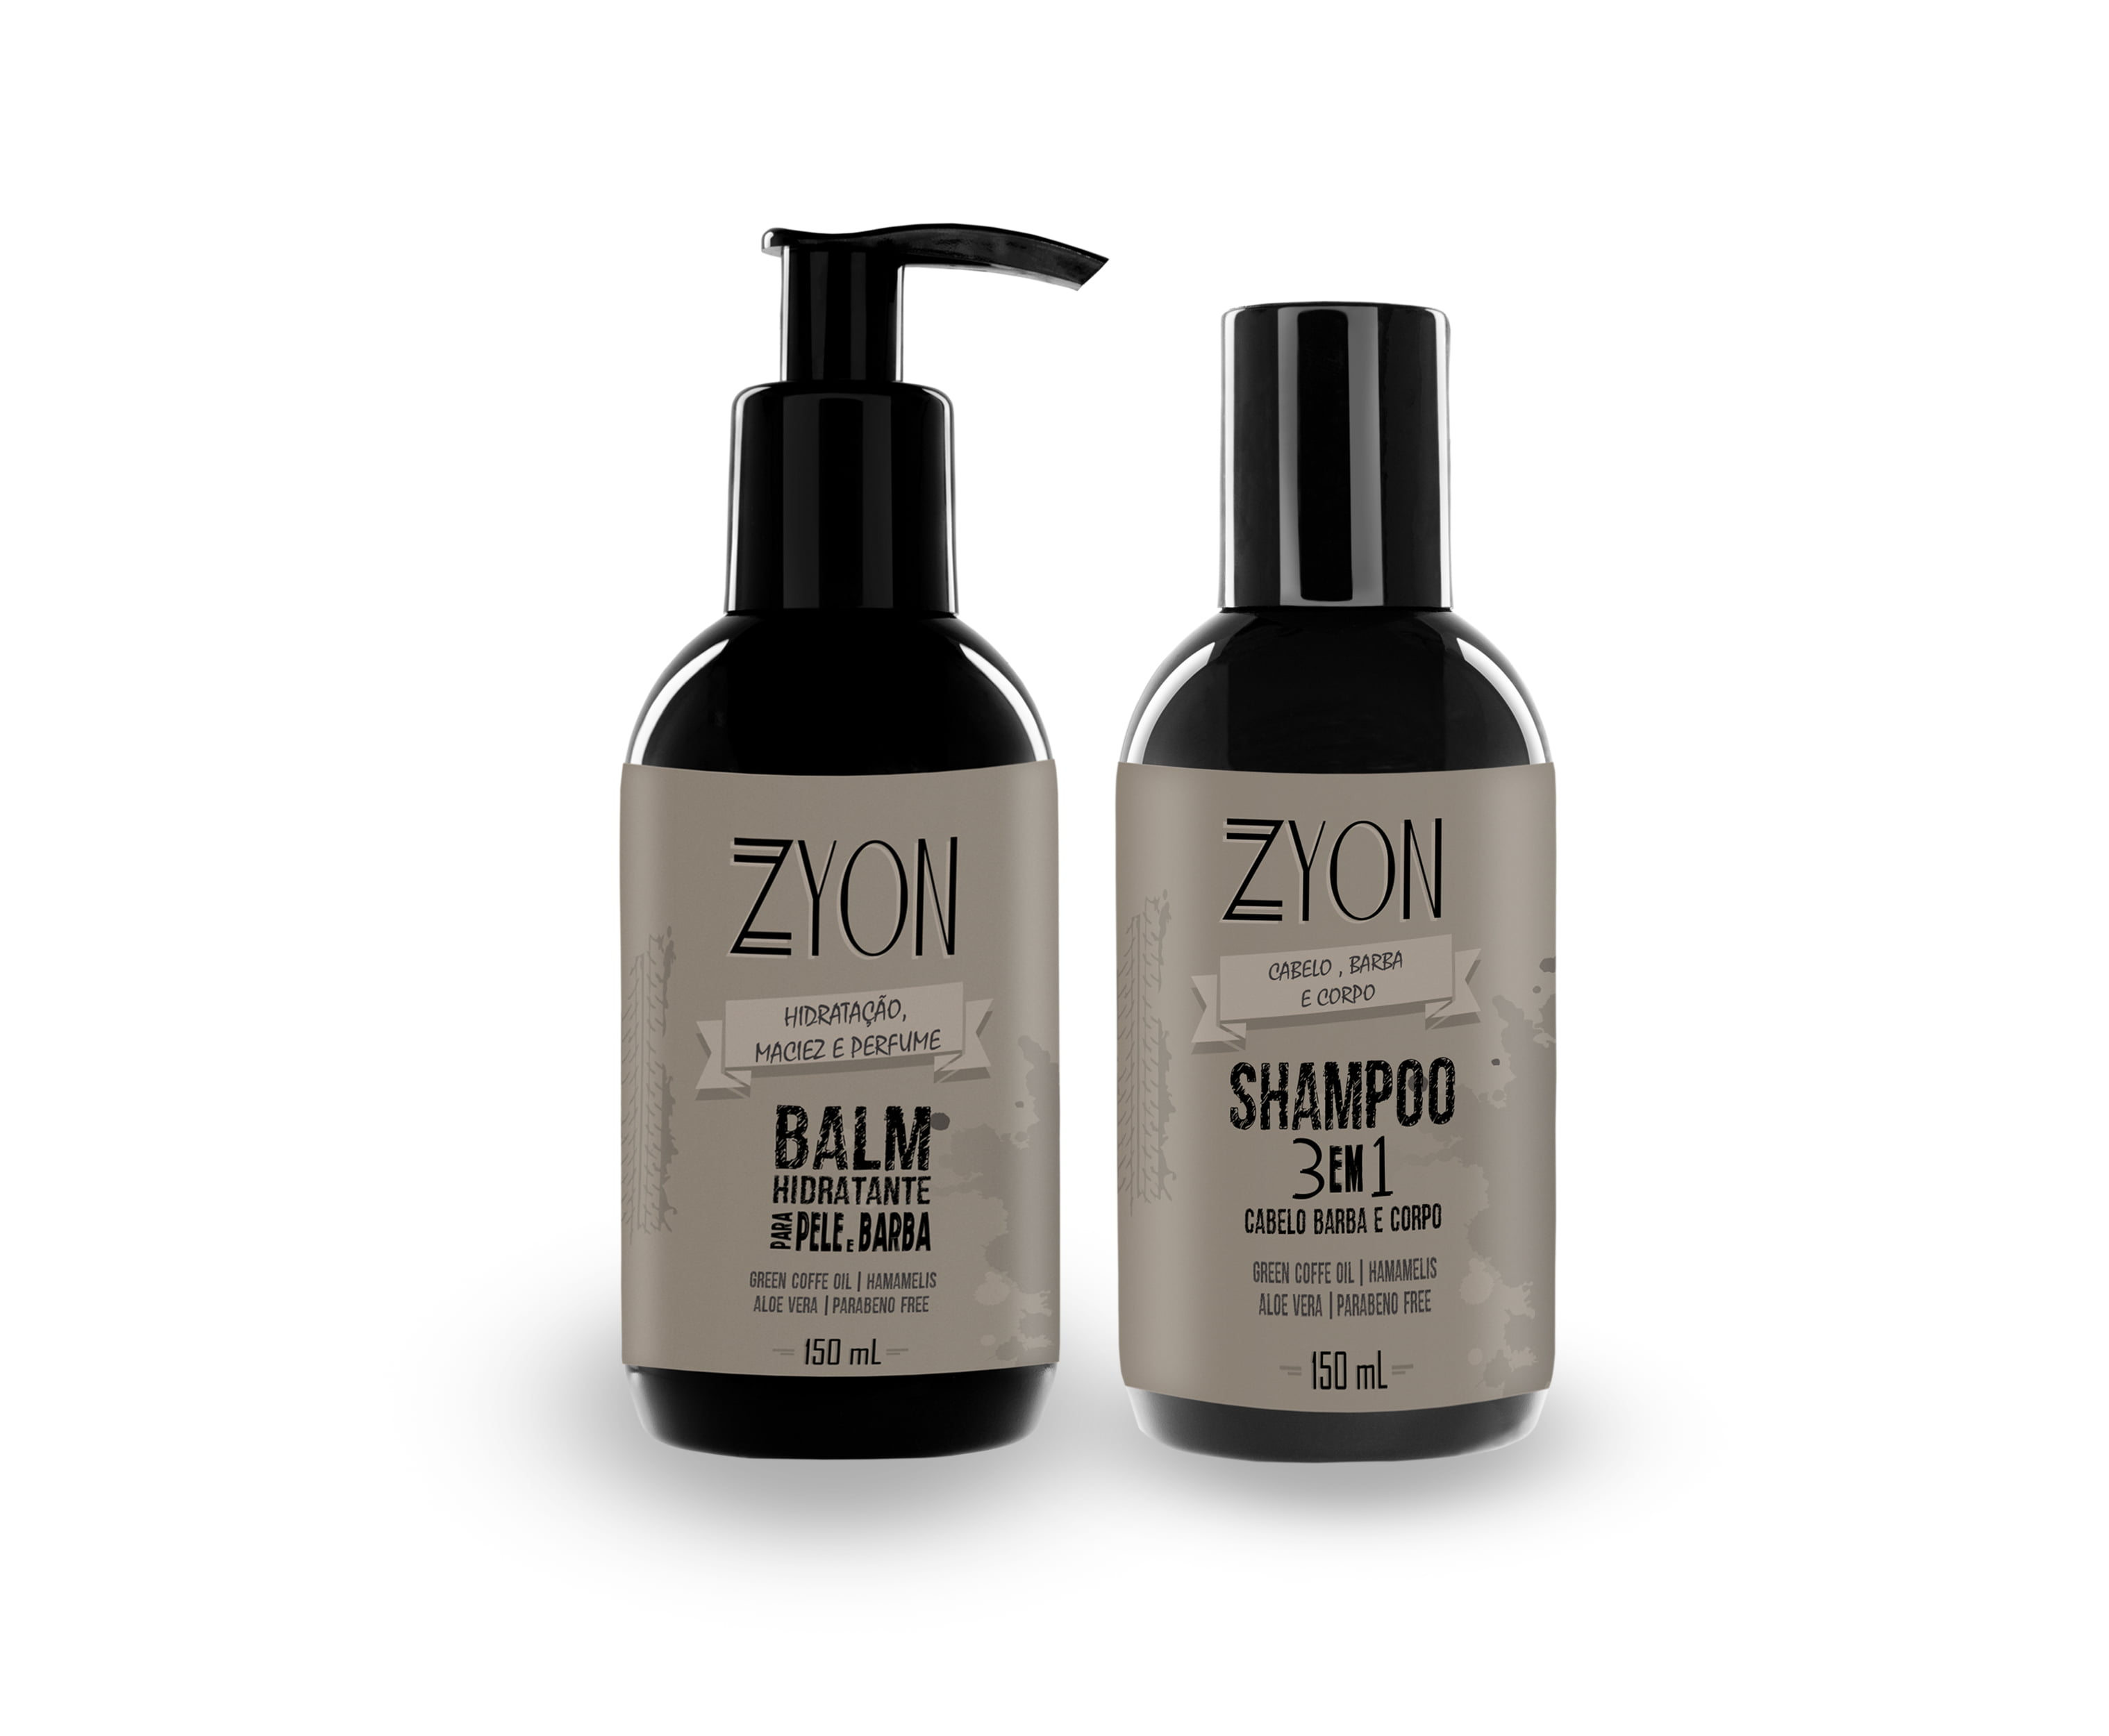 Kit para Barba Balm e Shampoo